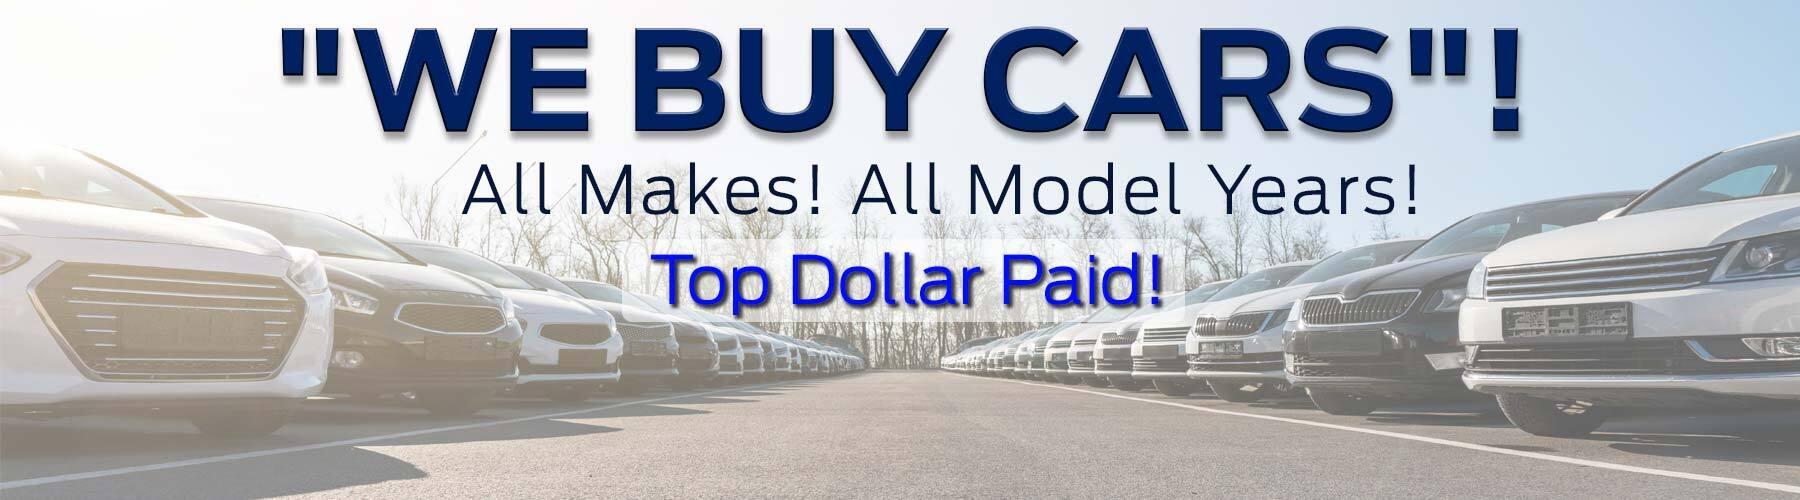 We Buy Used Vehicles